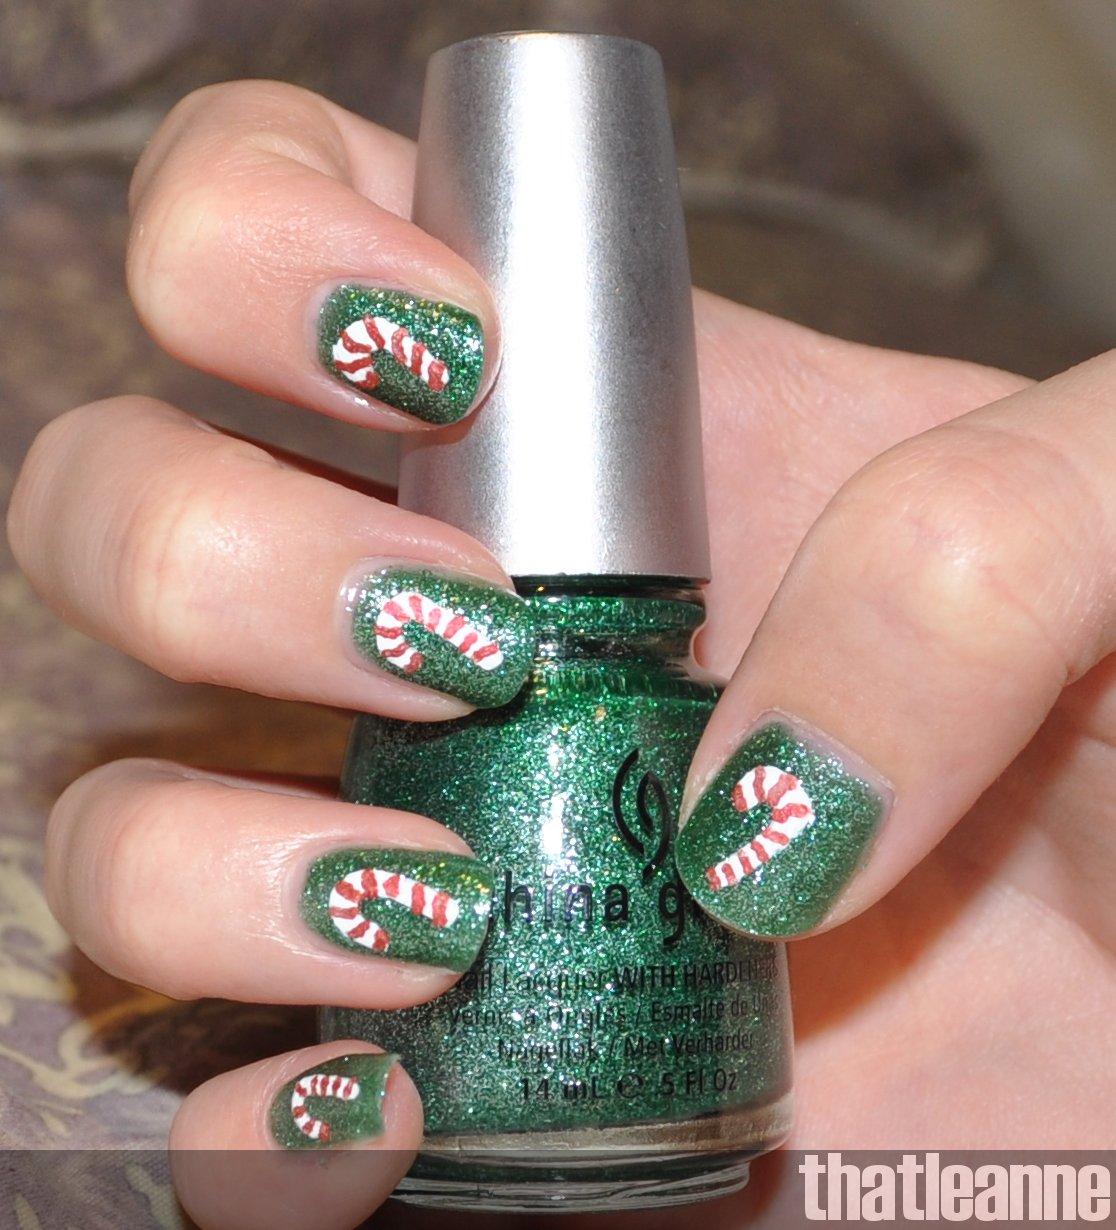 candycane nail tips.